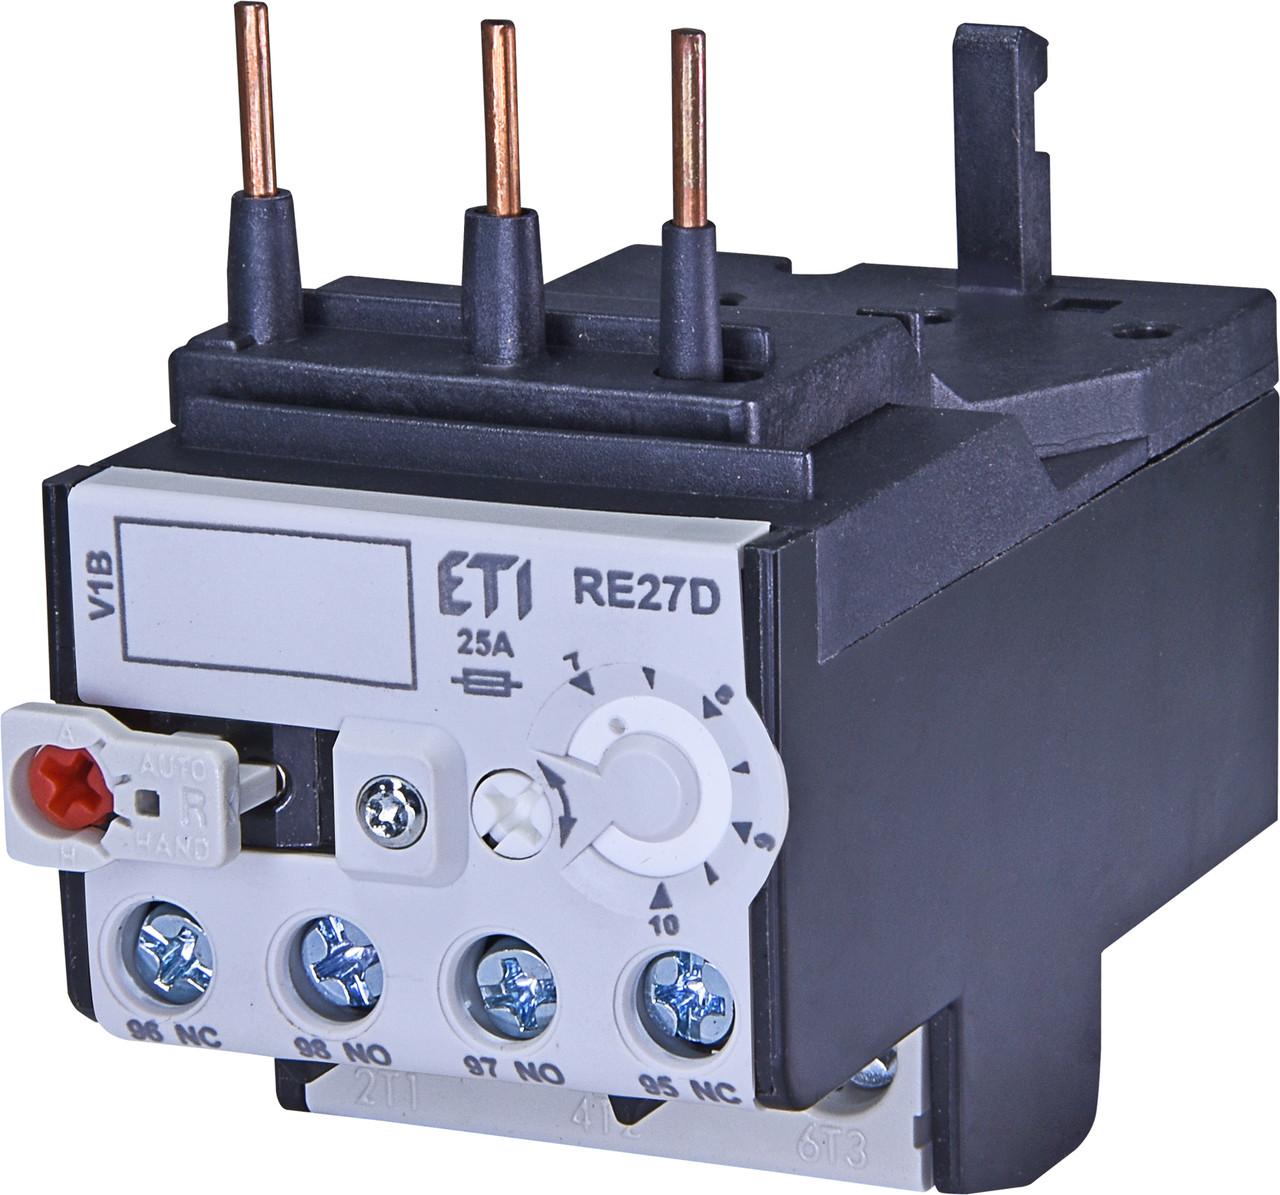 Тепловое реле ETI RE 27D-10 (7-10A) CEM9-CEM25 4642409 (для контакторов CEM9, CEM12, CEM18, CEM25)